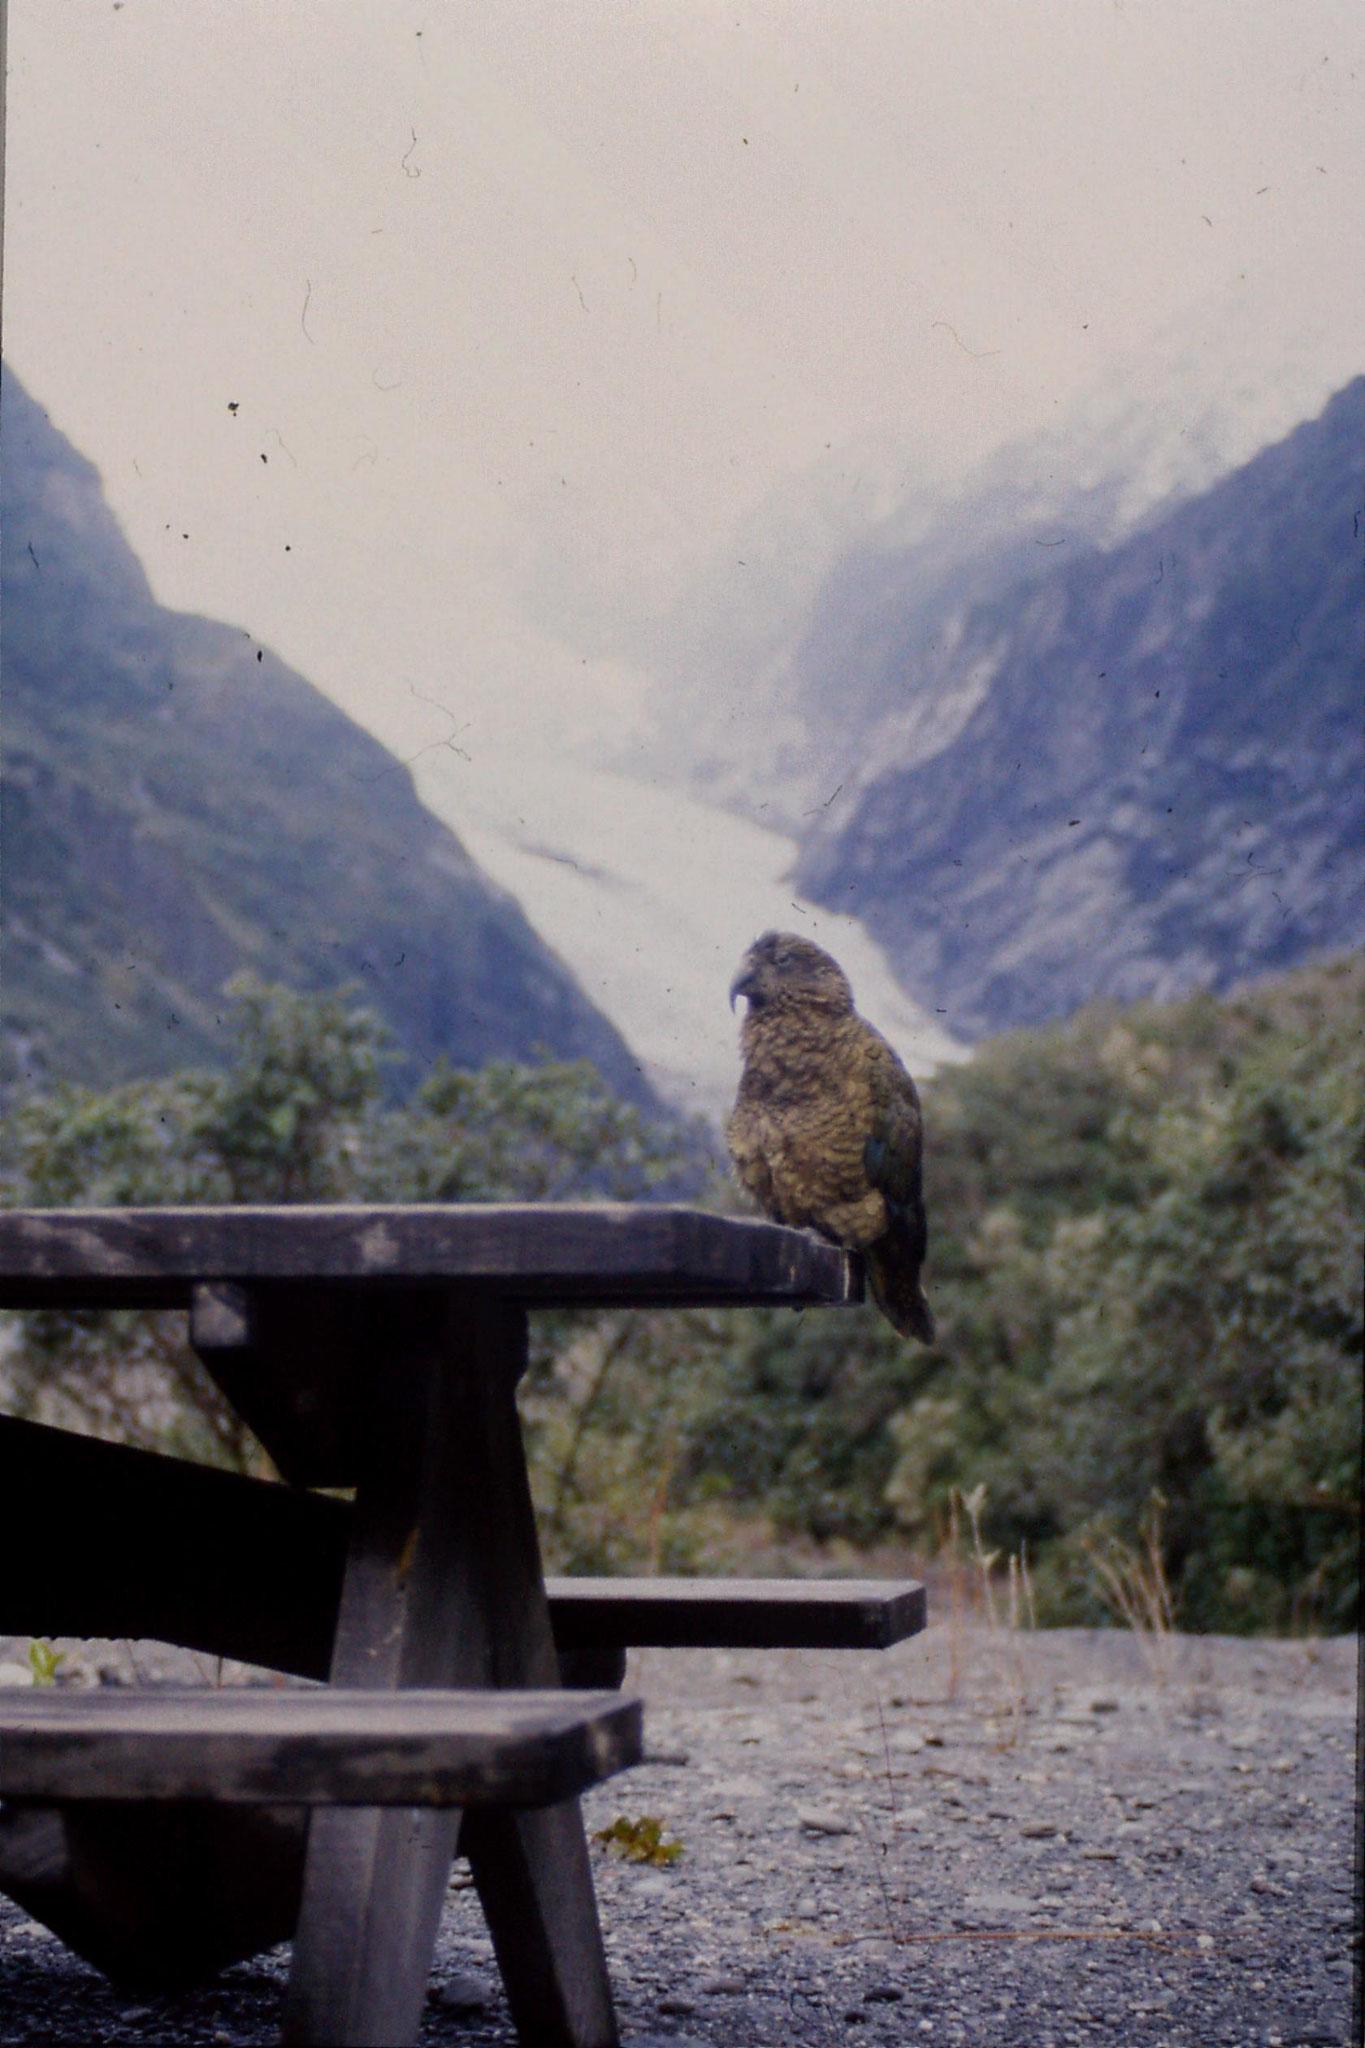 22/8/1990: 34: Keas at Franz Joseph Glacier